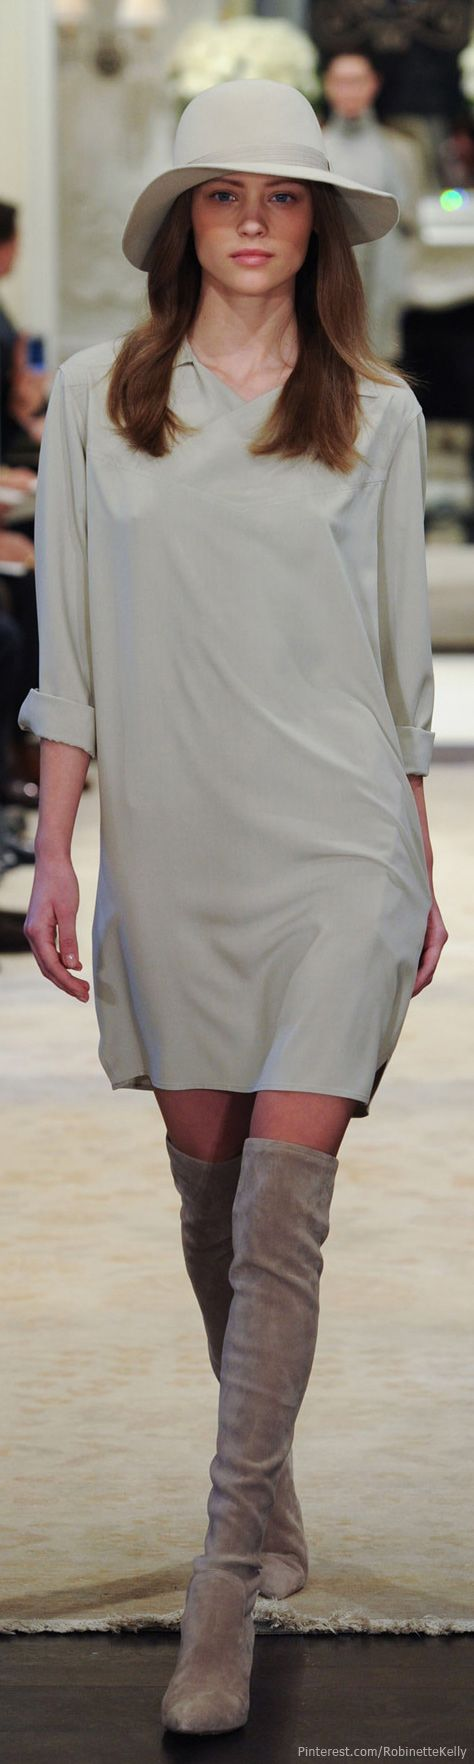 Ralph Lauren | Pre-Fall 2014 || Portrait - Fashion - Editorial - Runway - Catwalk - Photography - Pose Idea